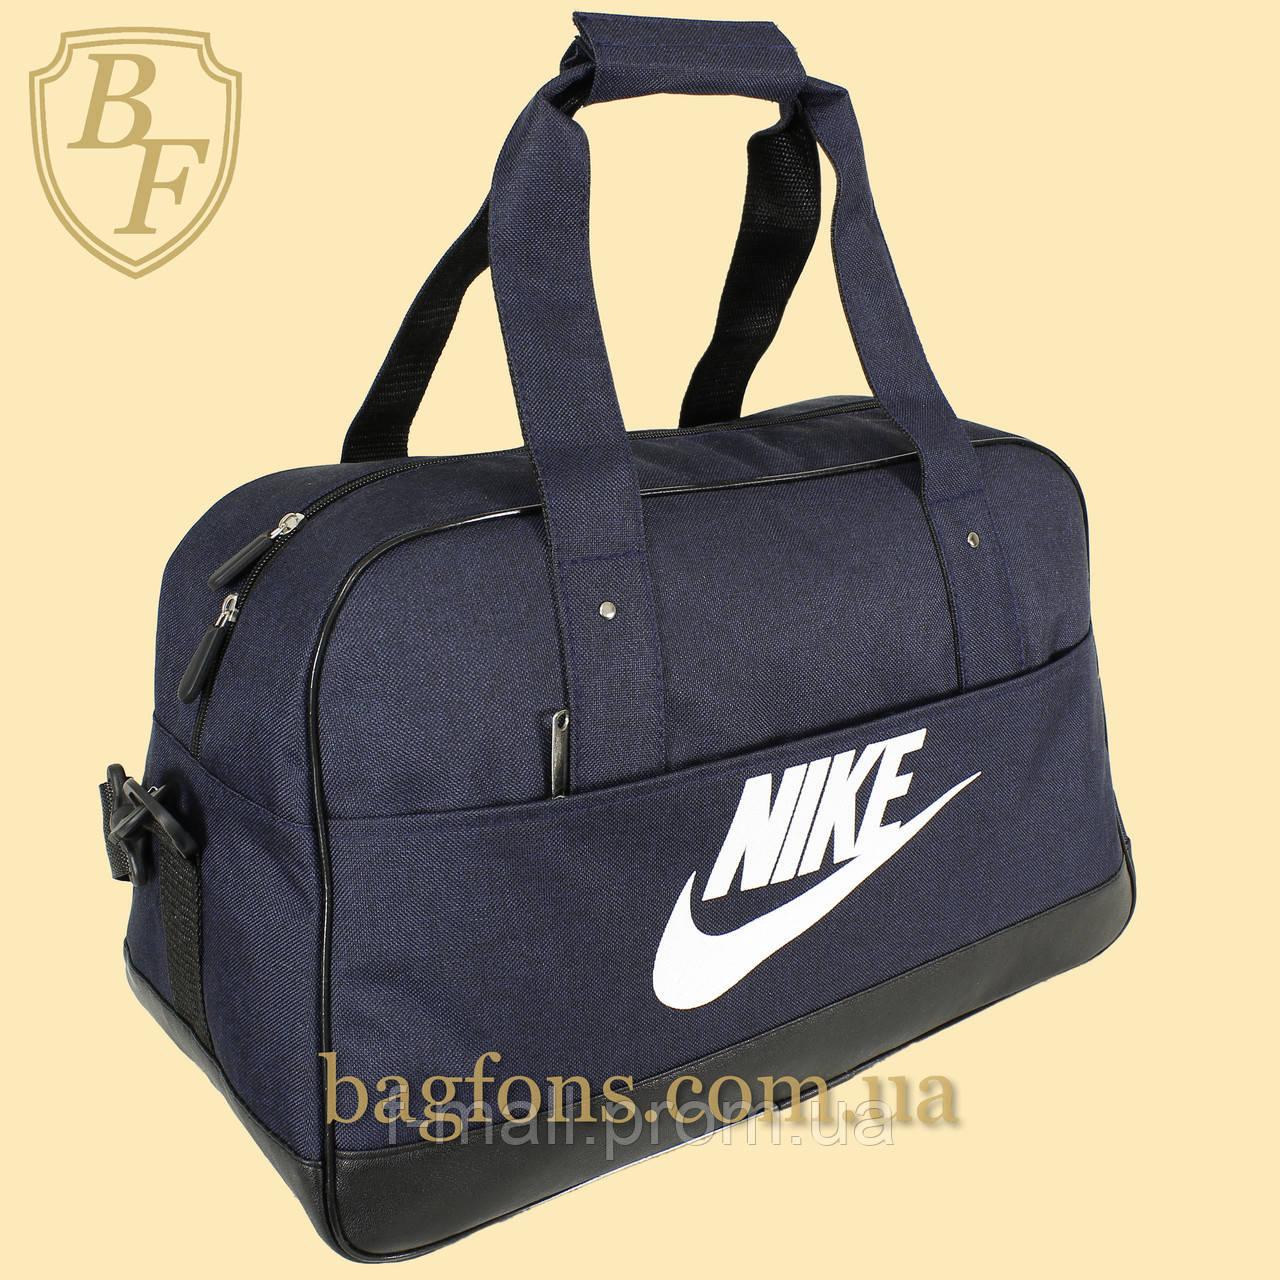 Спортивная дорожная сумка Nike мужская, женская 30л (SN025)